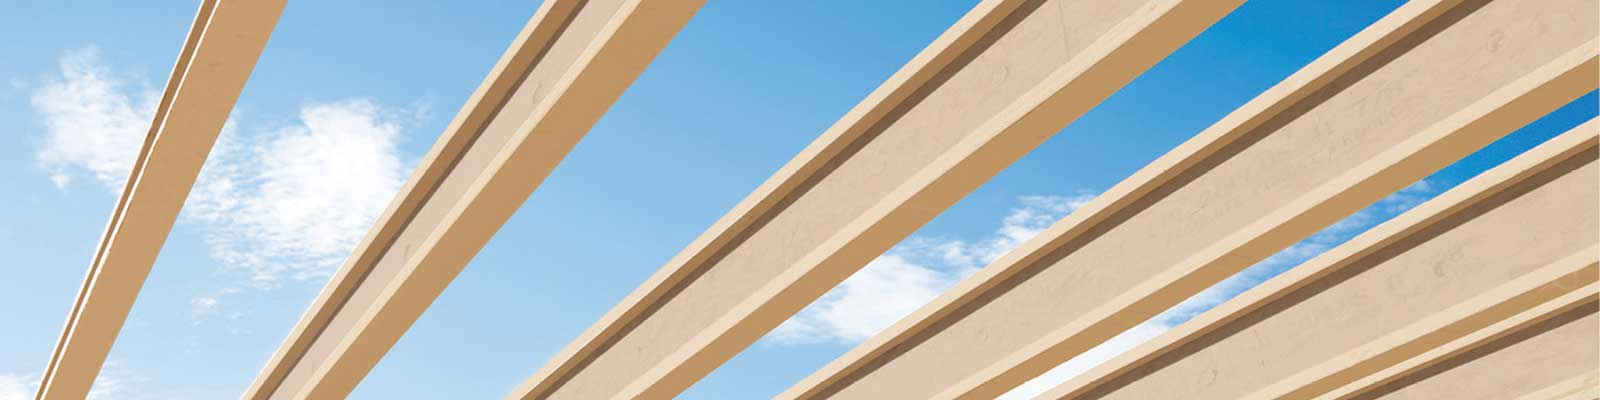 Lumber - M & M Building Supplies